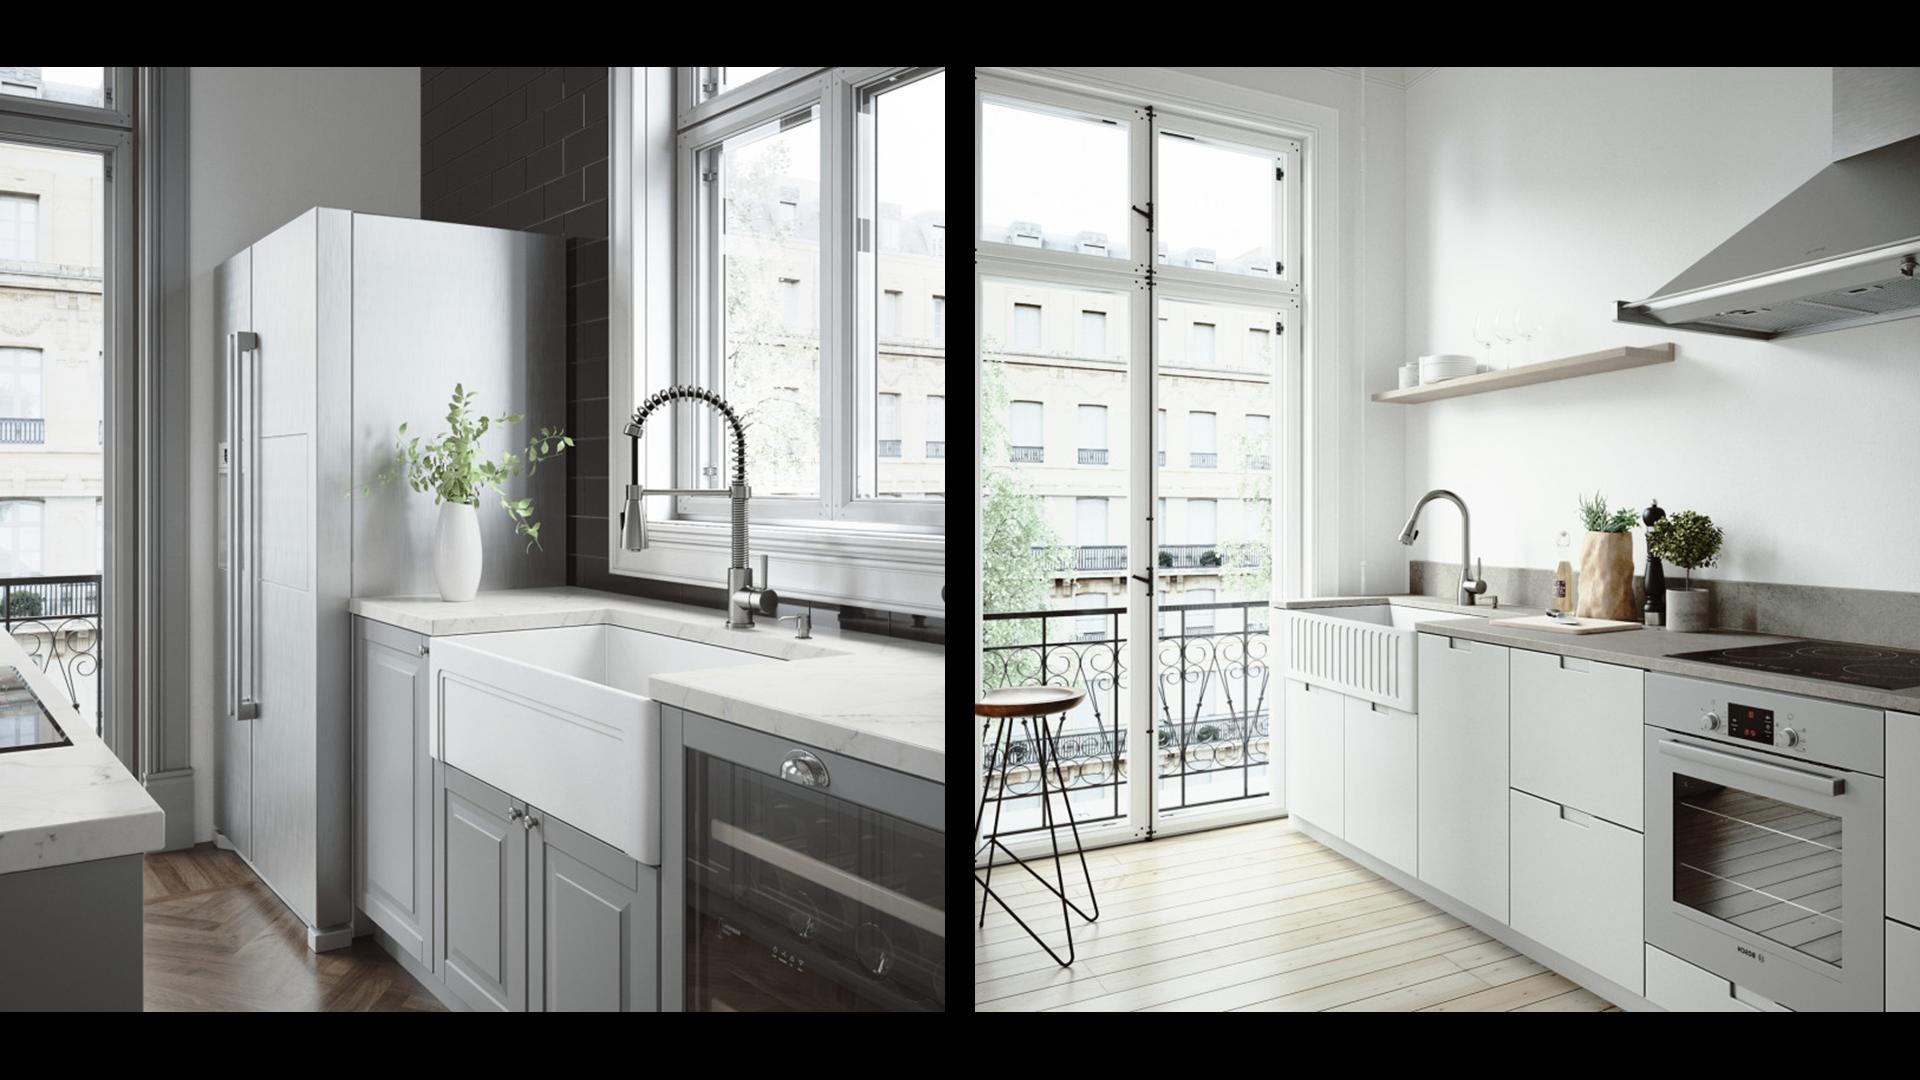 Two VIGO Matte Stone Farmhouse Kitchen Sinks, one double bowl model and one single bowl model